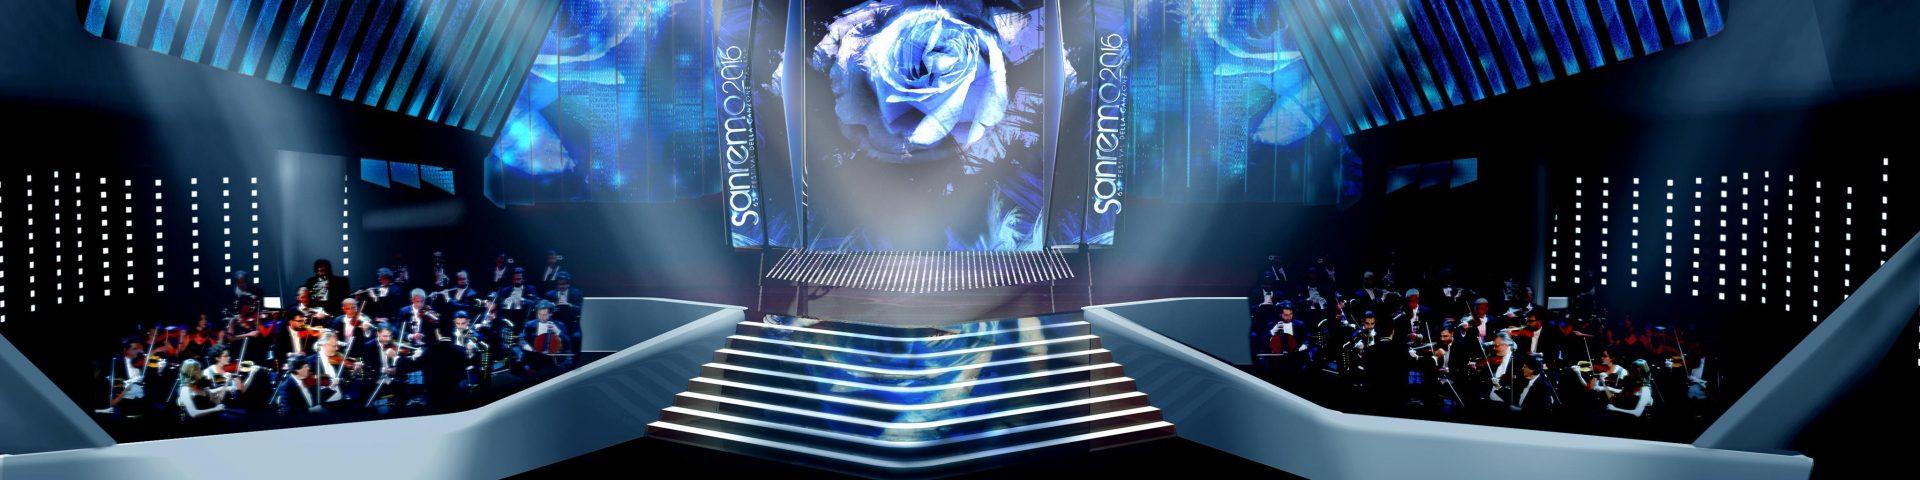 Sanremo 2019: annunciati i primi 11 Big in gara